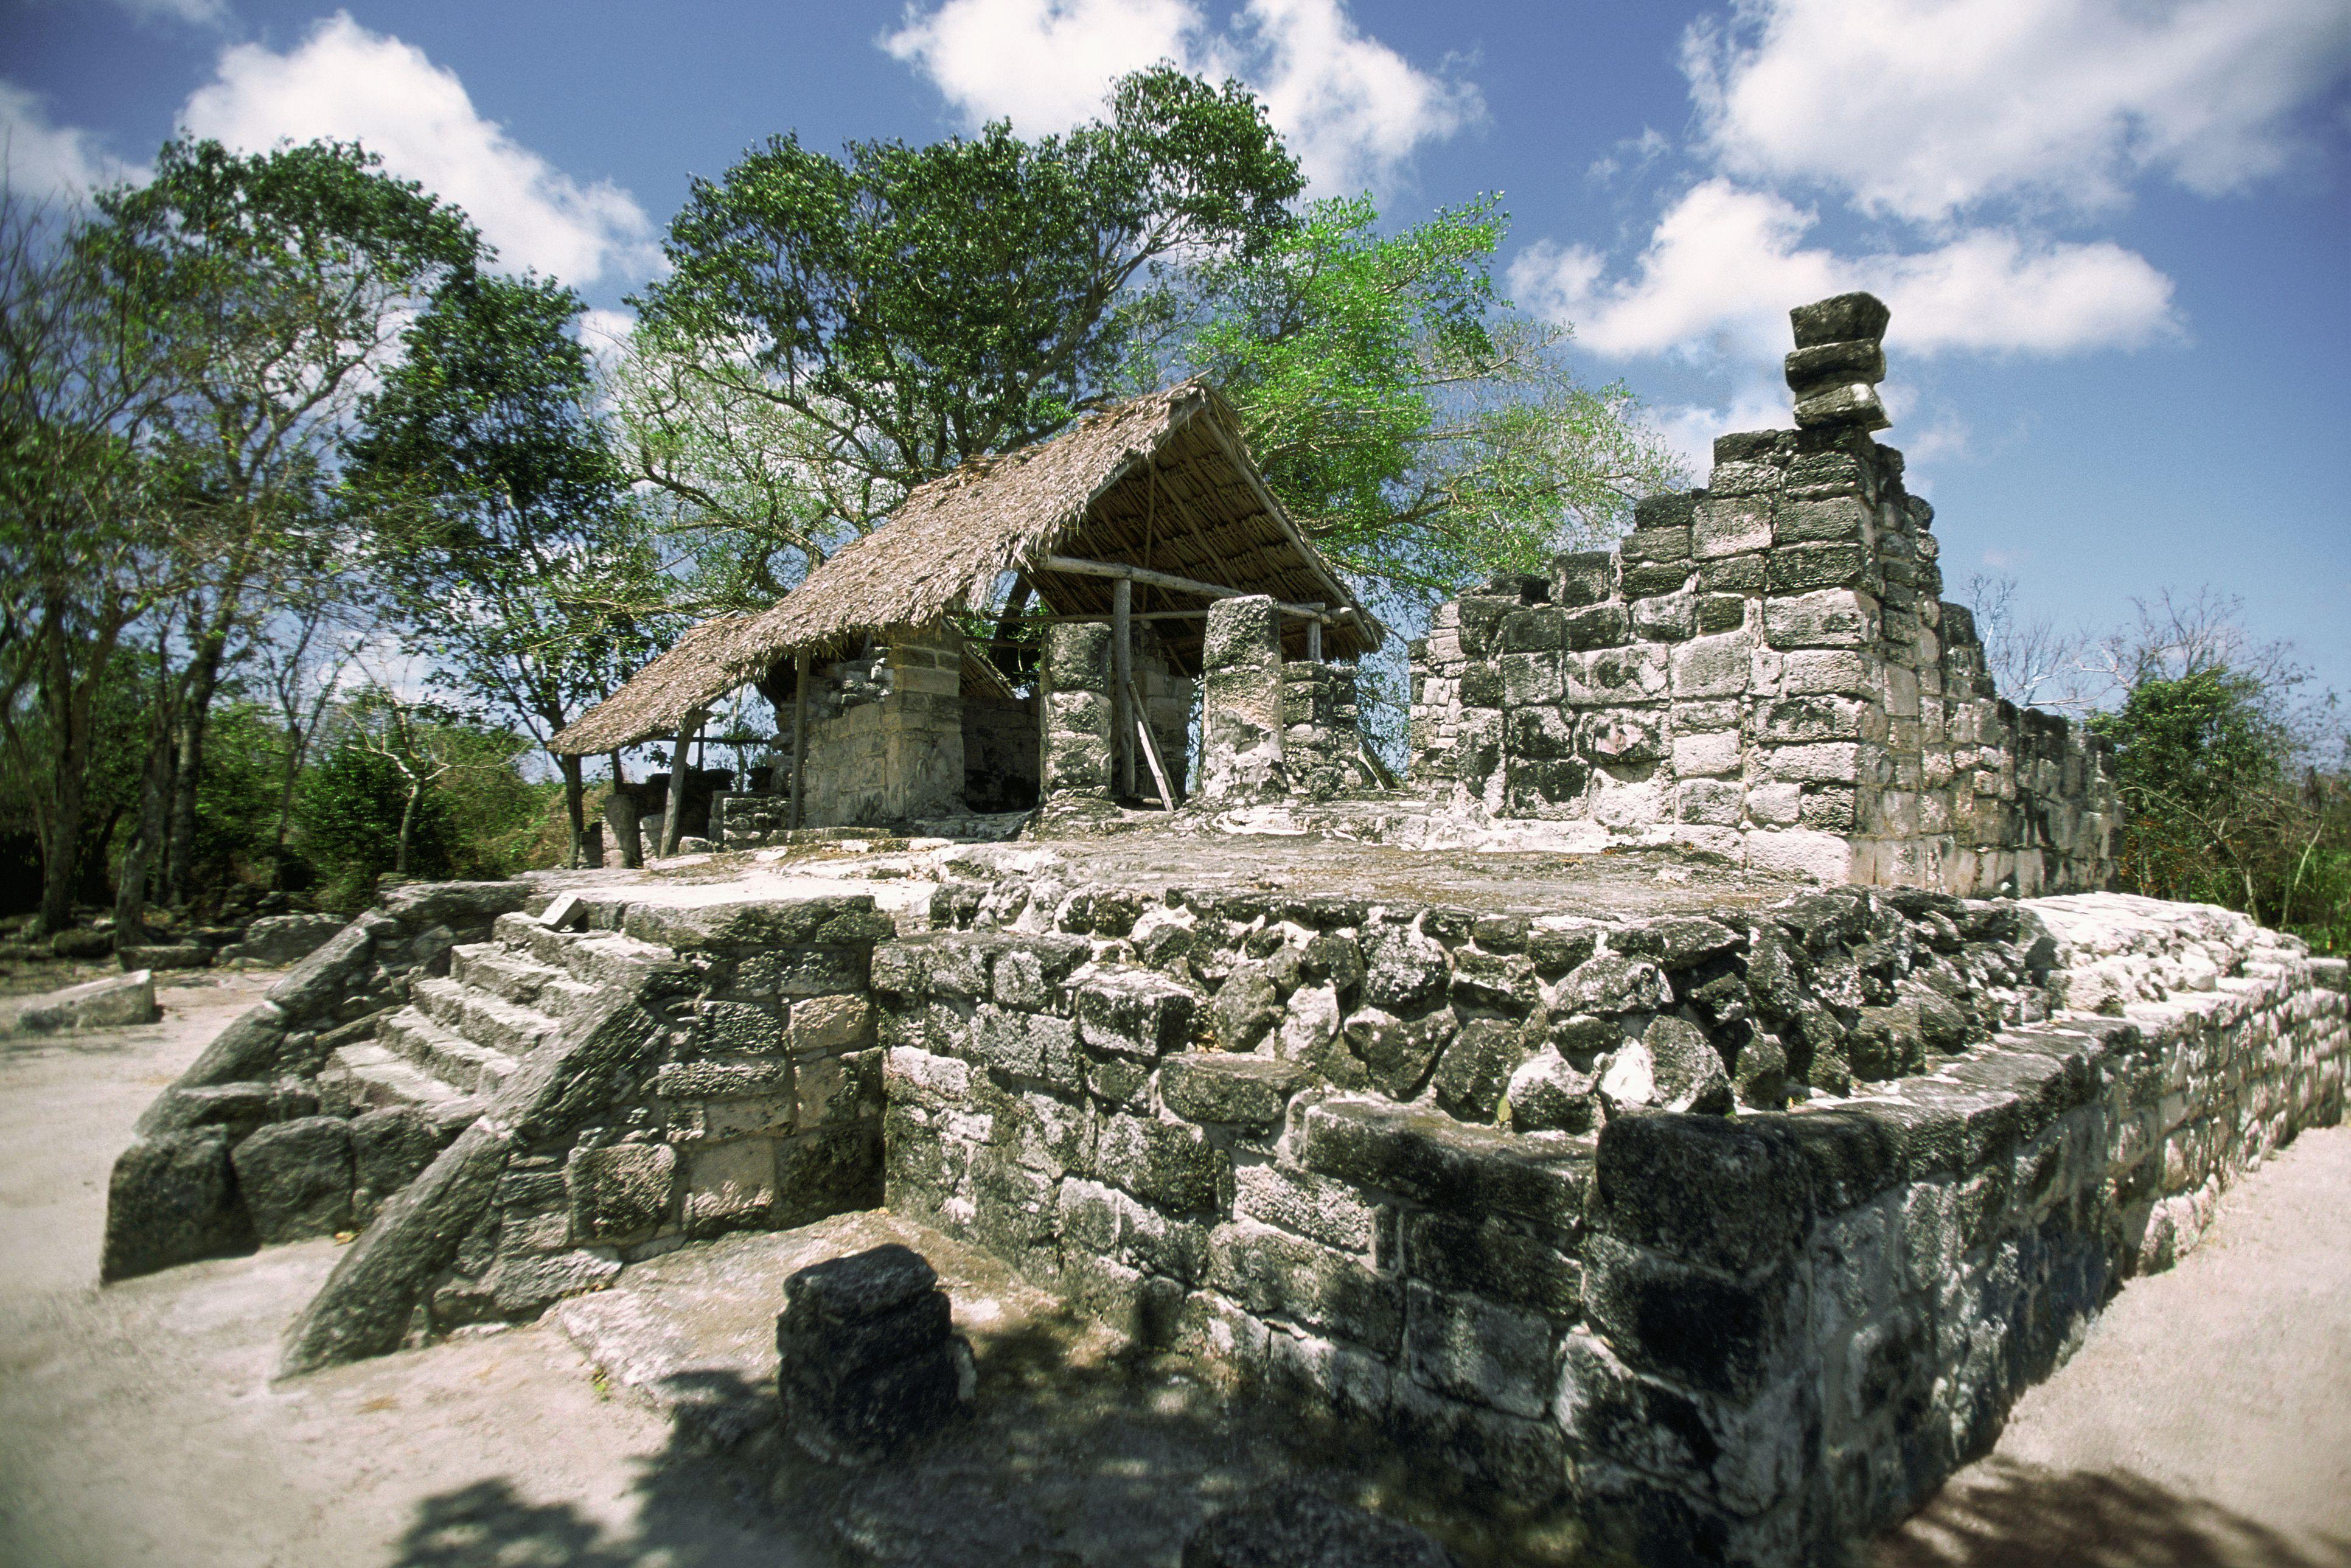 Mexico, Cozumel, San Gervasio, Mayan ruins